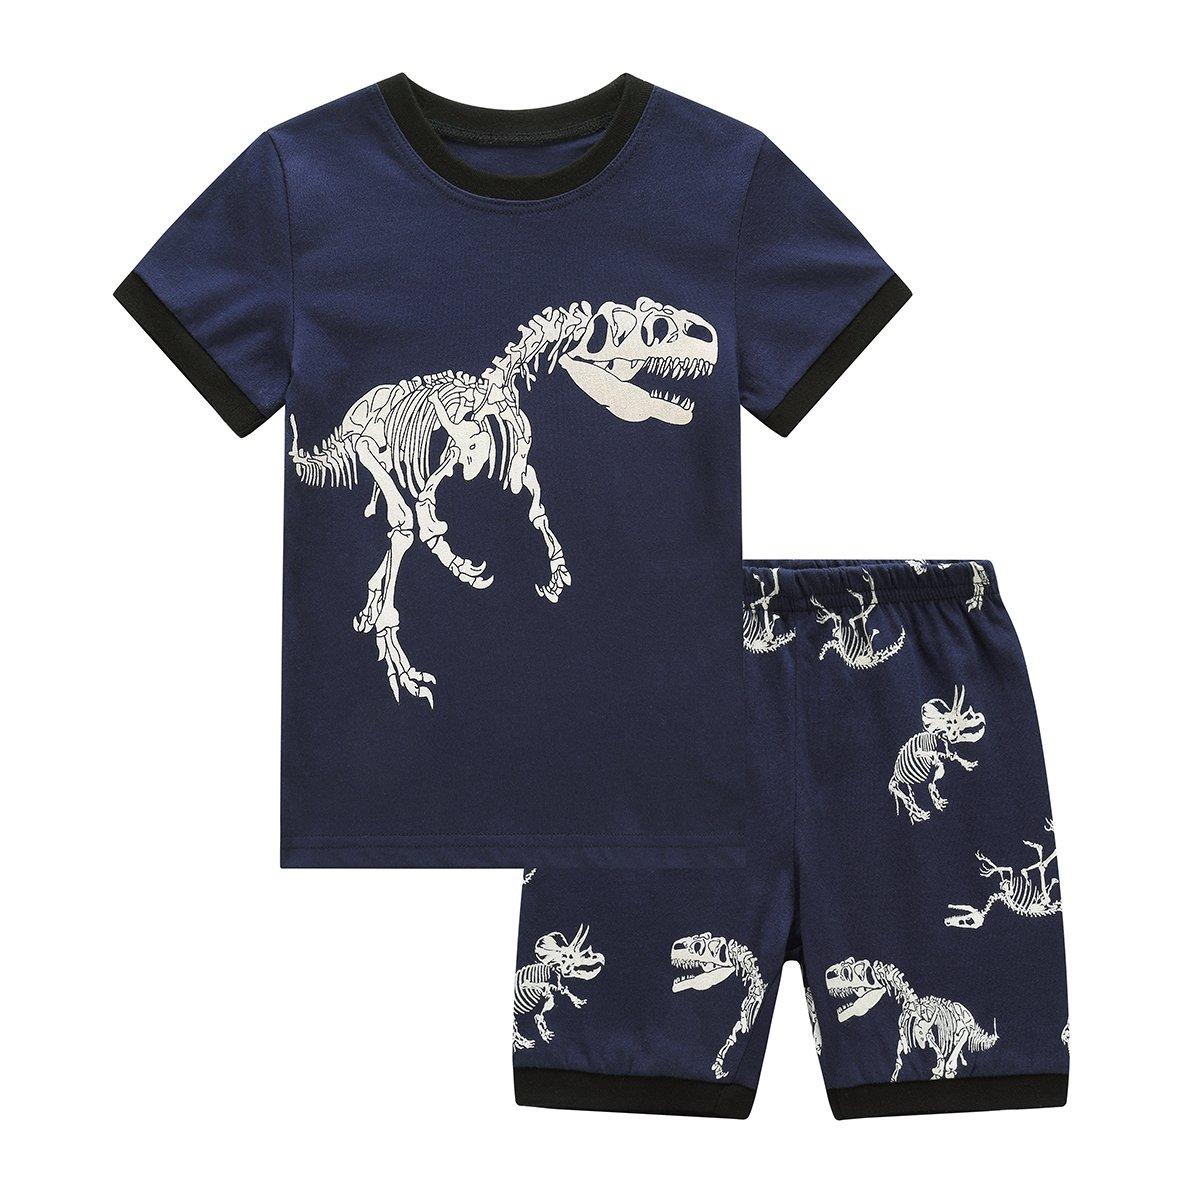 Koian Little Boys Short Pajamas Sets Toddler PJS Cotton Kids Sleepwears (Blue Dinosaur, 2T)